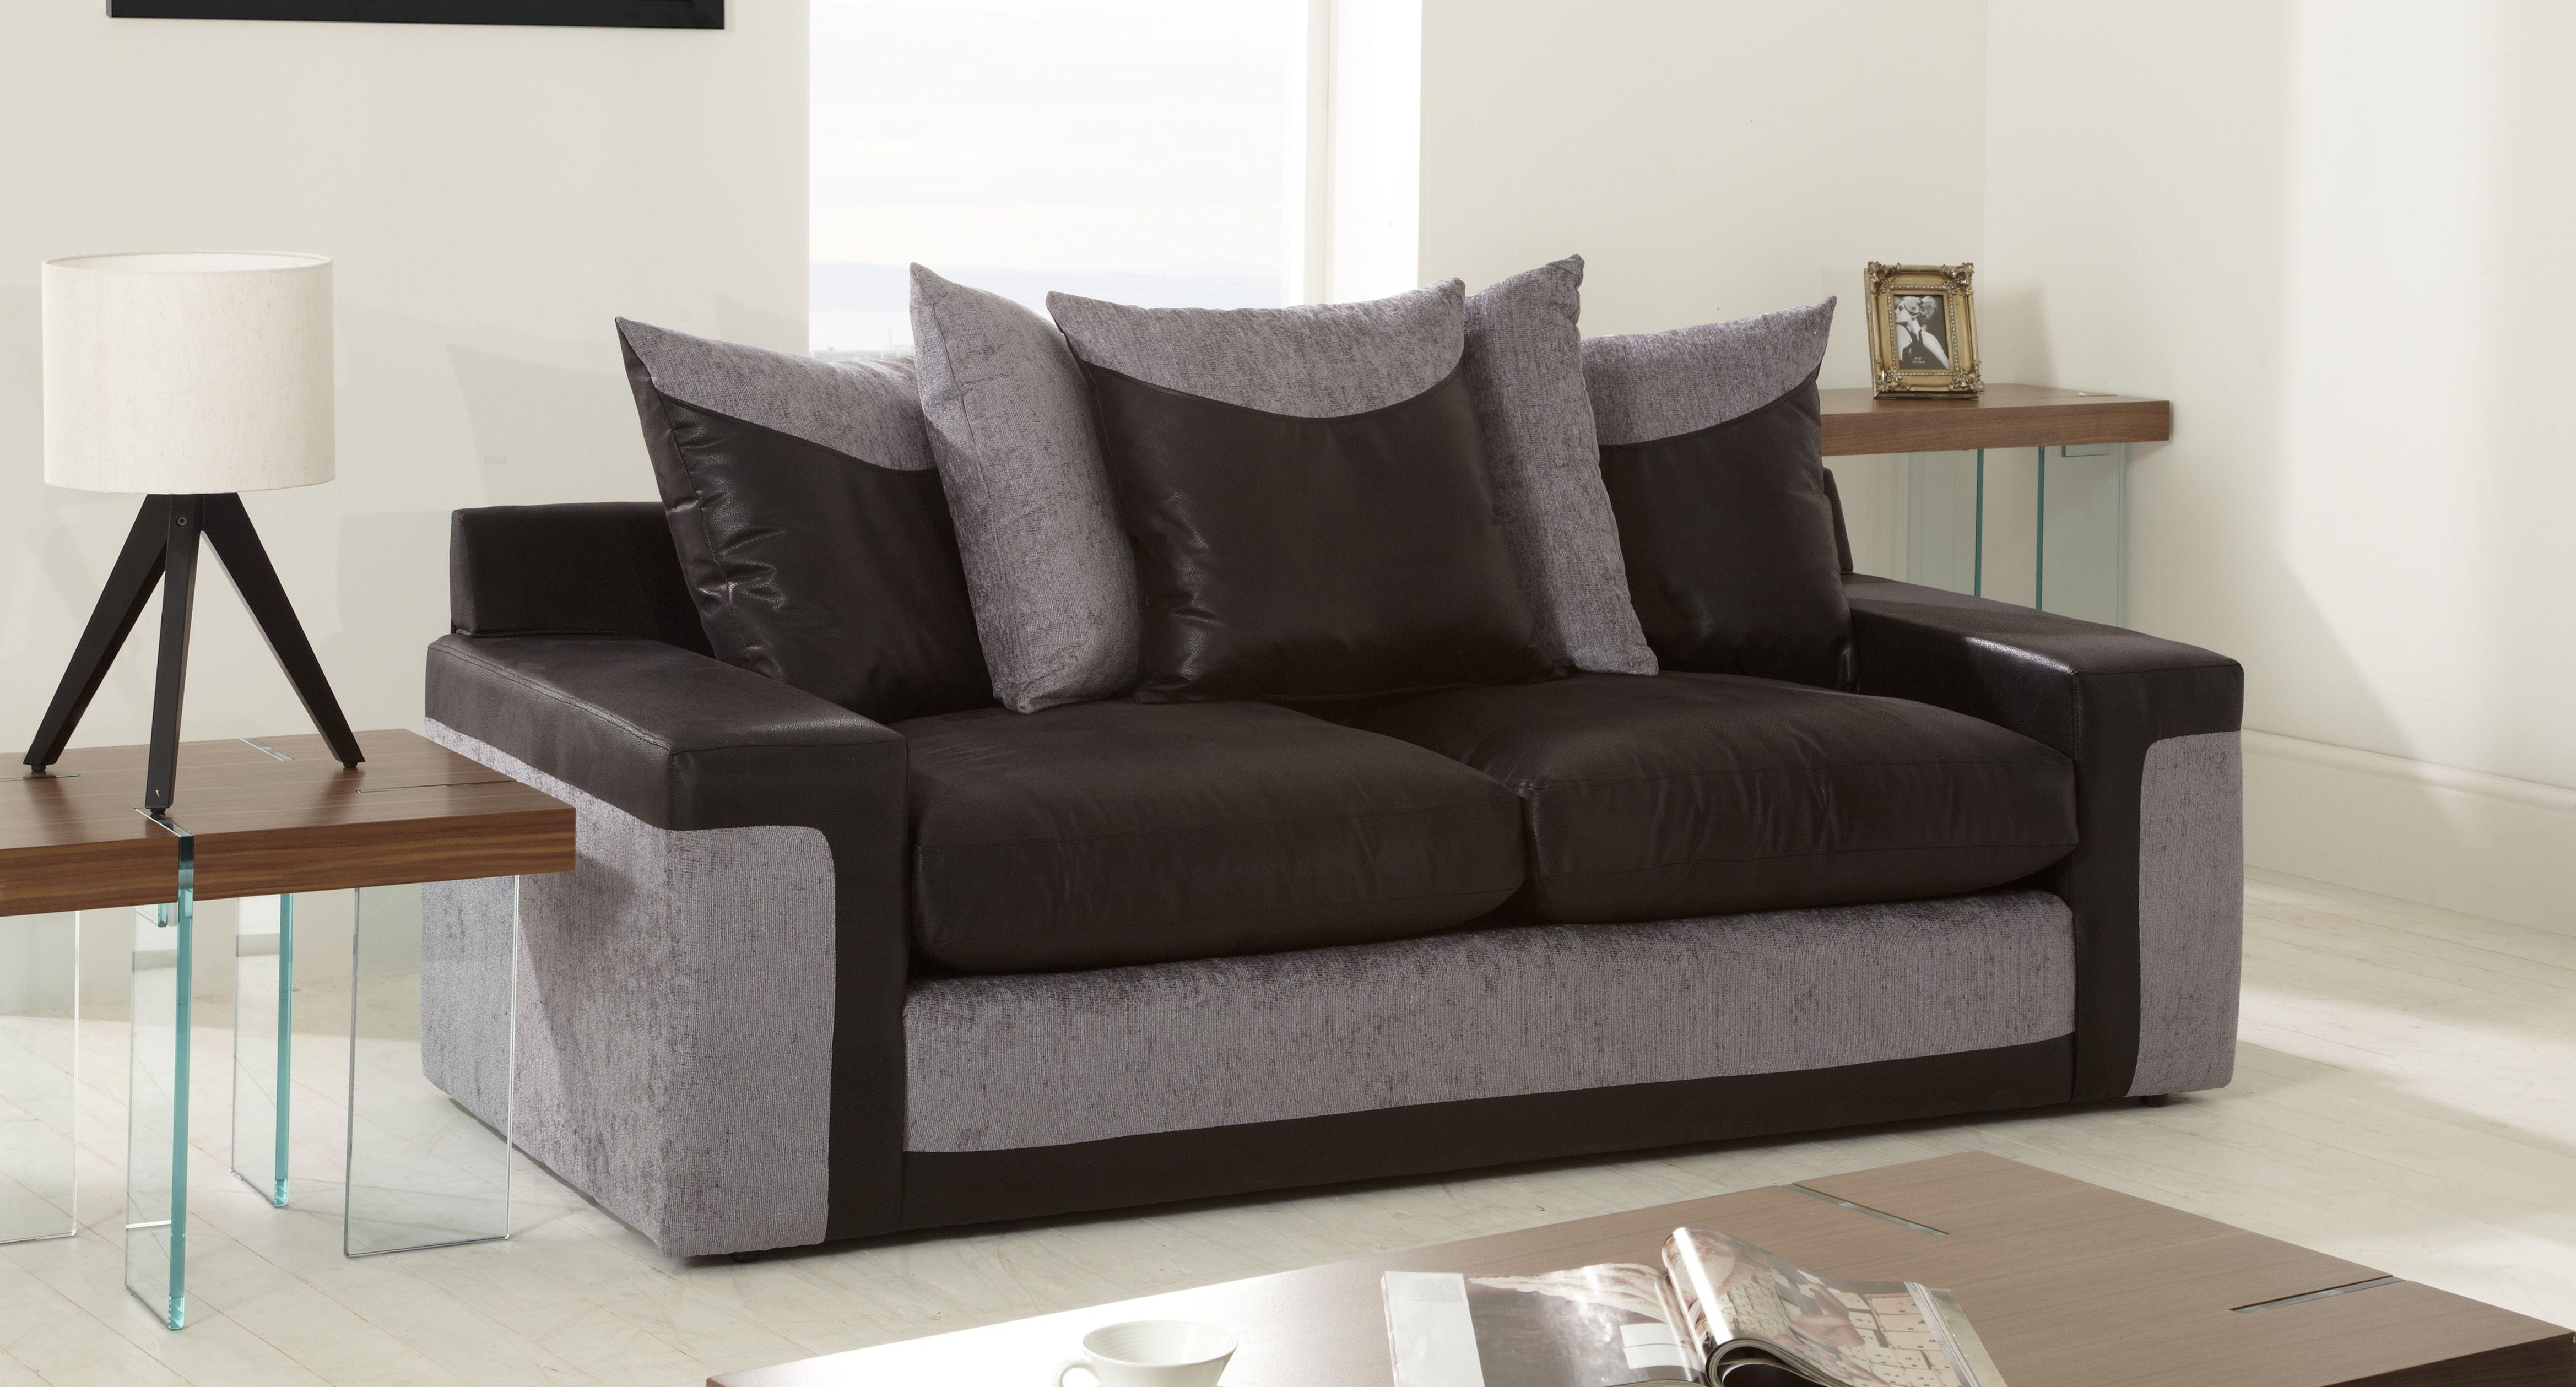 Tufted Sofa Link Seater Sofa Scatter Back sofa leather black